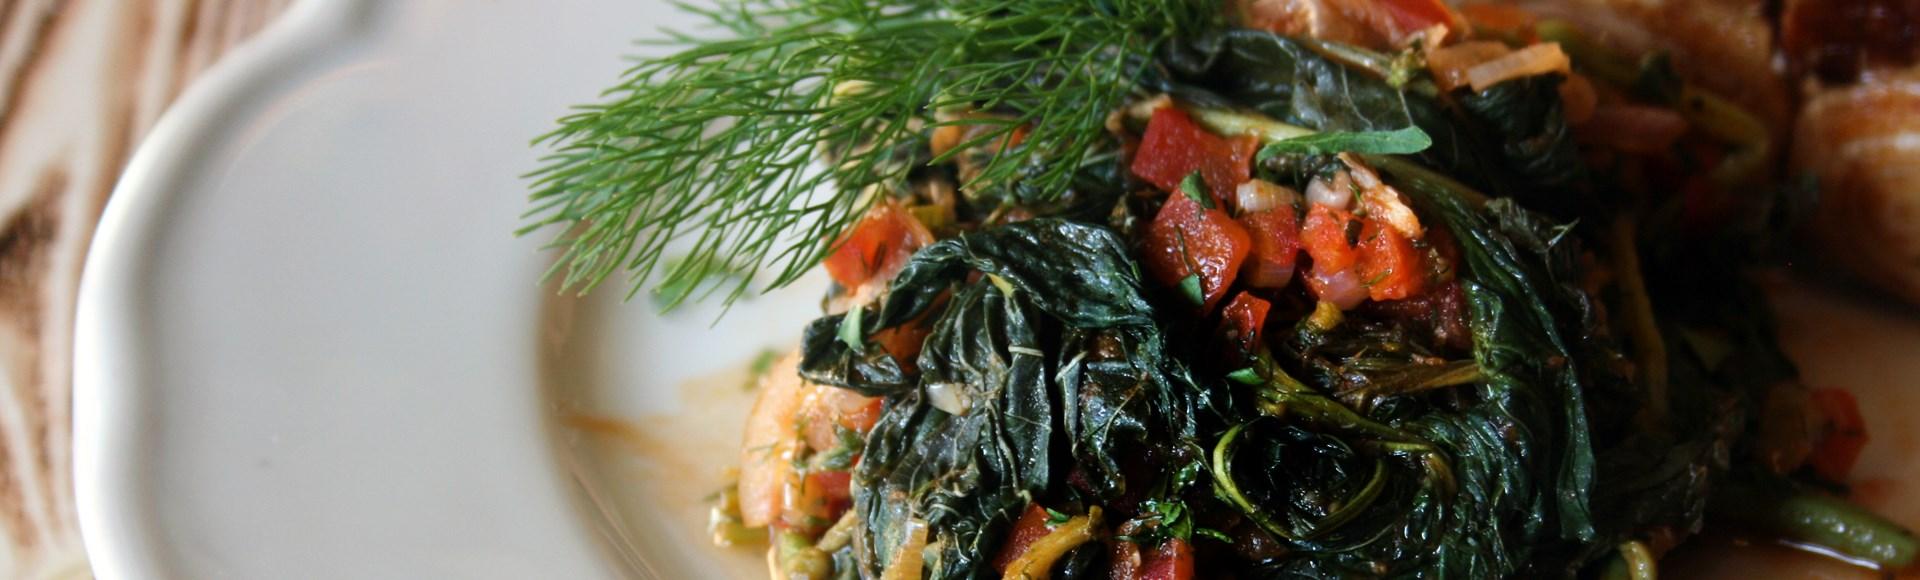 antonis-stavros-chania-crete-greece-18 - Chef Antonis & Stavros - Chania, Kreta, Hellas - Alargo | Håndplukkede ferieboliger på Kreta, Korfu og Paros